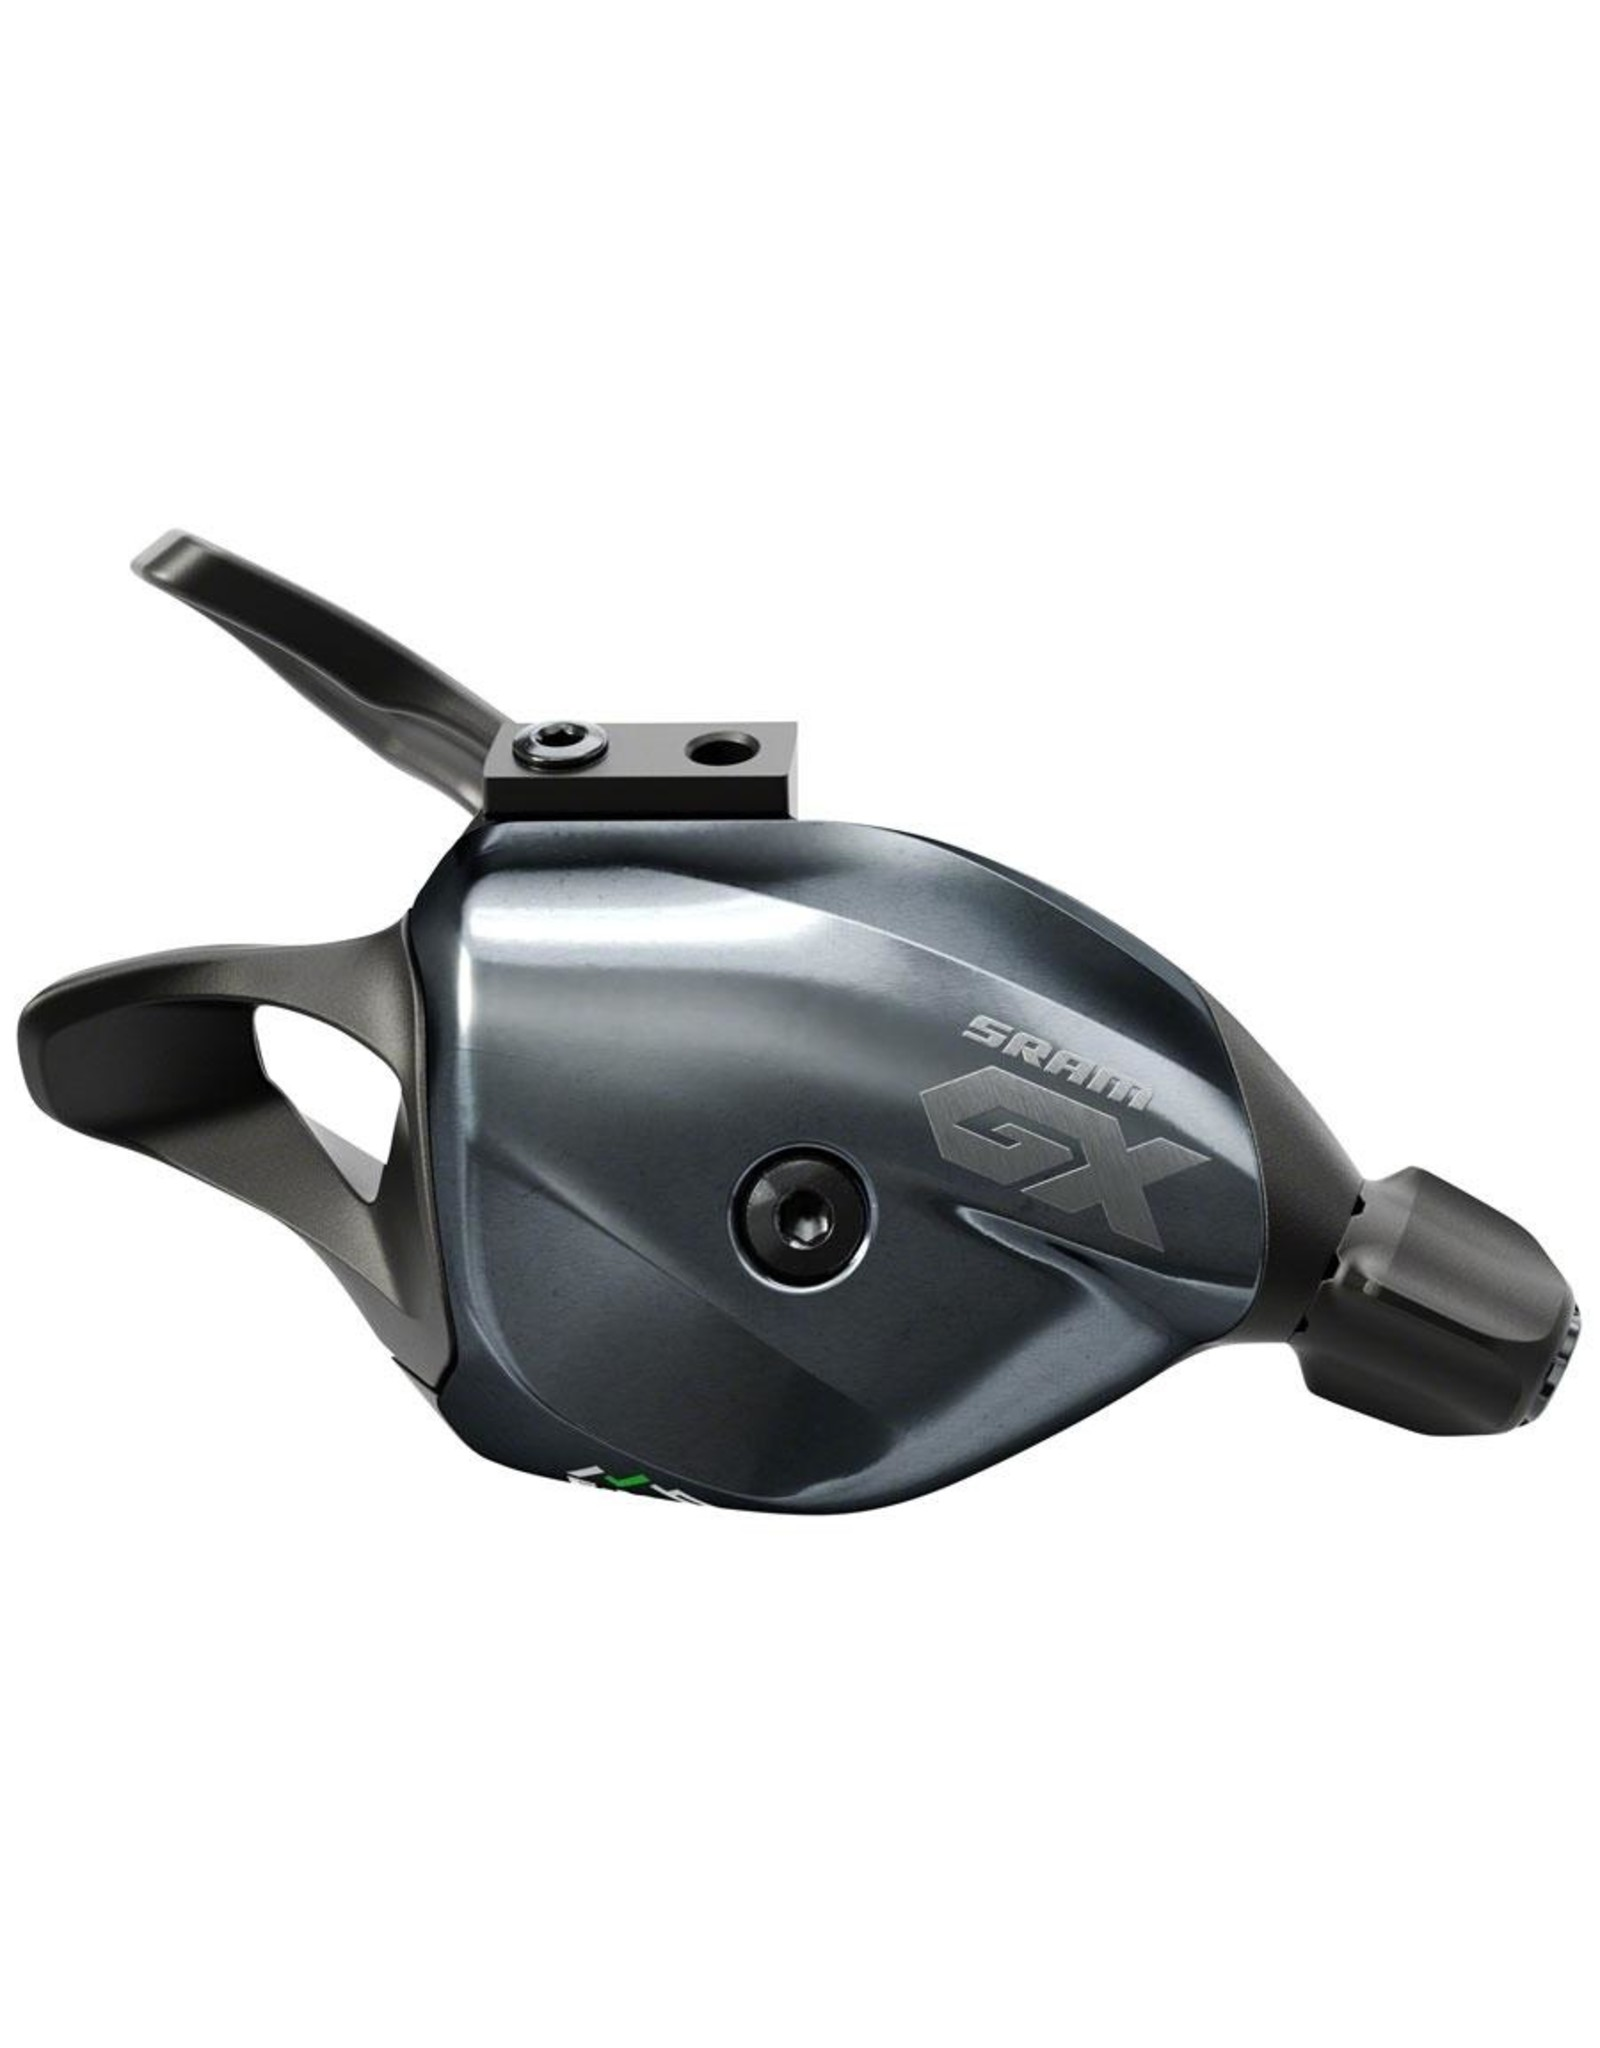 SRAM SRAM GX Eagle Trigger Shifter - Rear, 12-Speed, Discrete Clamp, Lunar